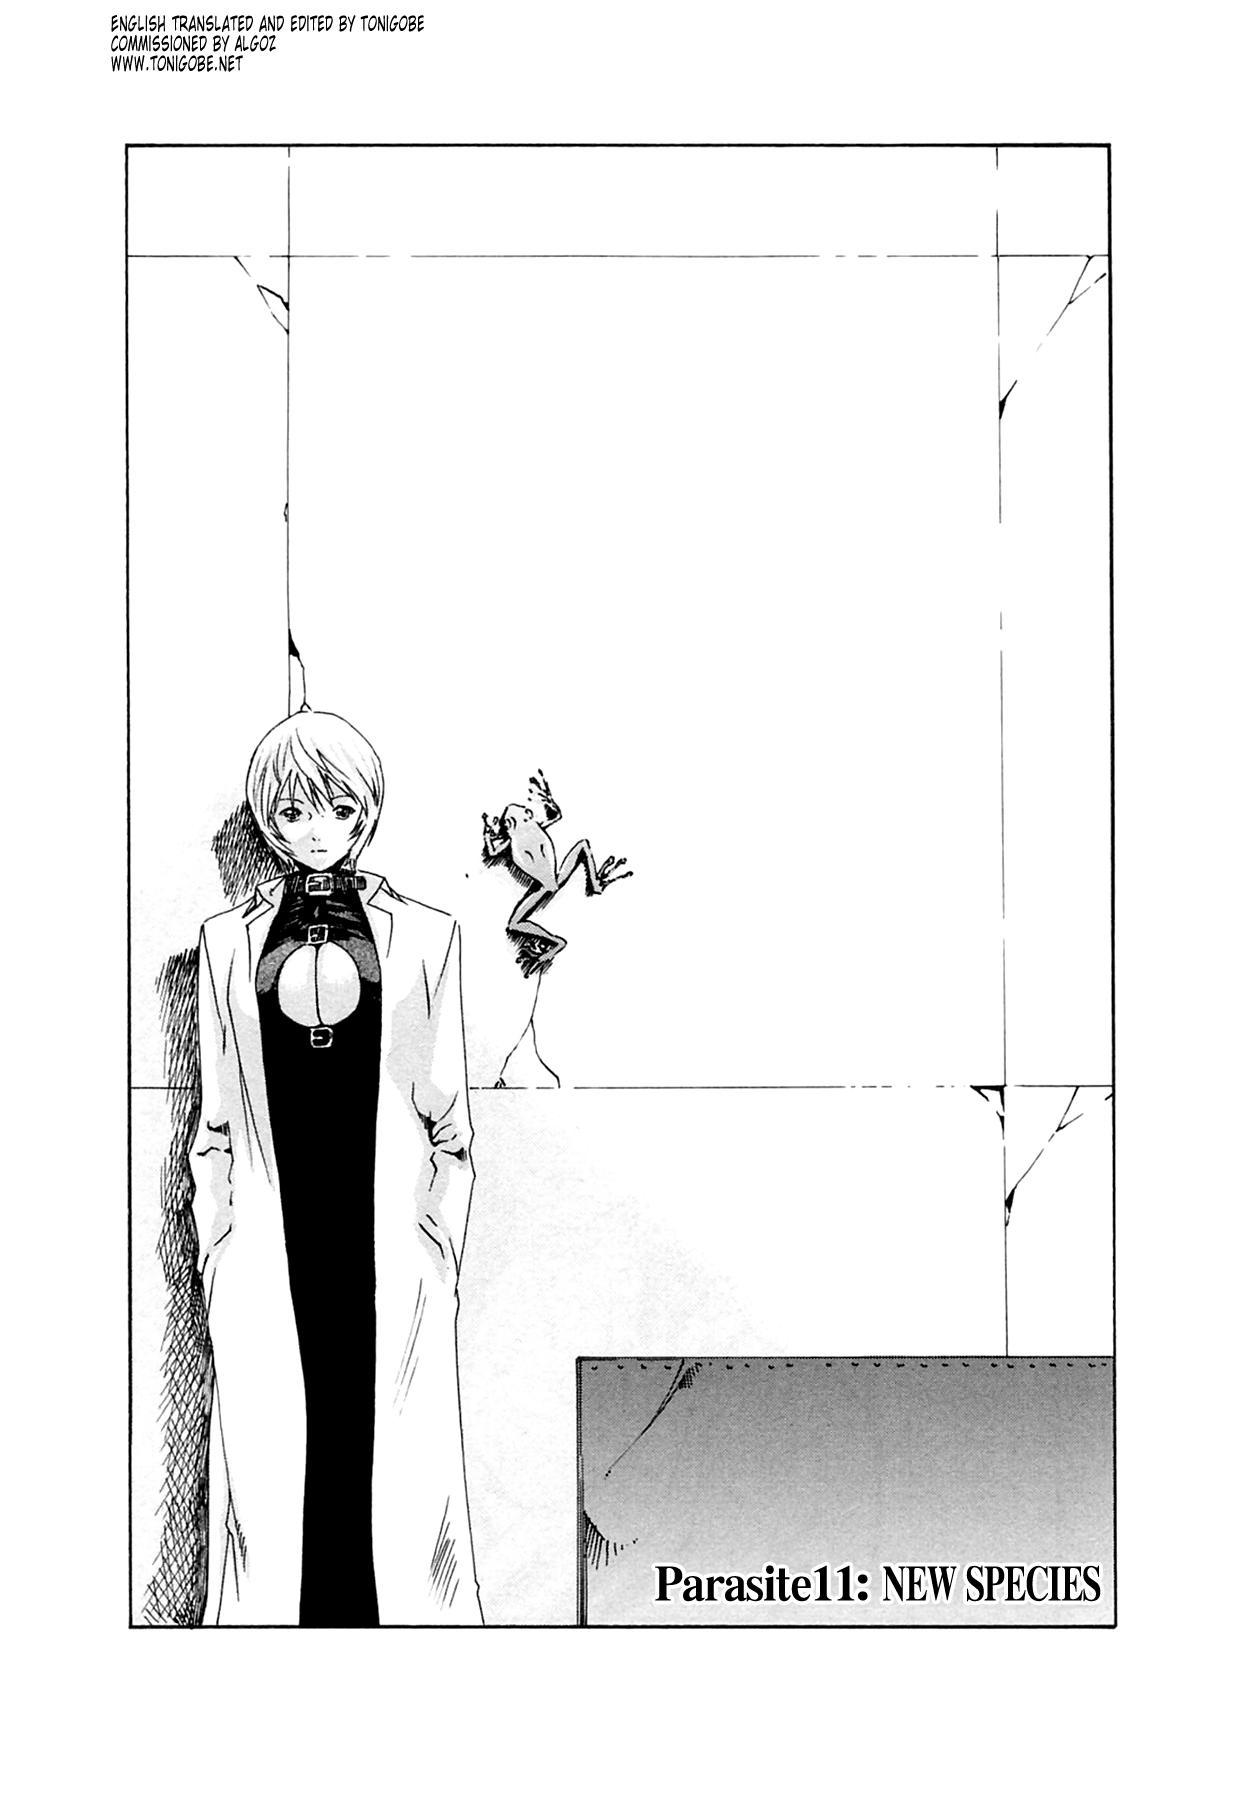 [Haruki] Kisei Juui Suzune (Parasite Doctor Suzune) Vol.02 - CH10-11 32